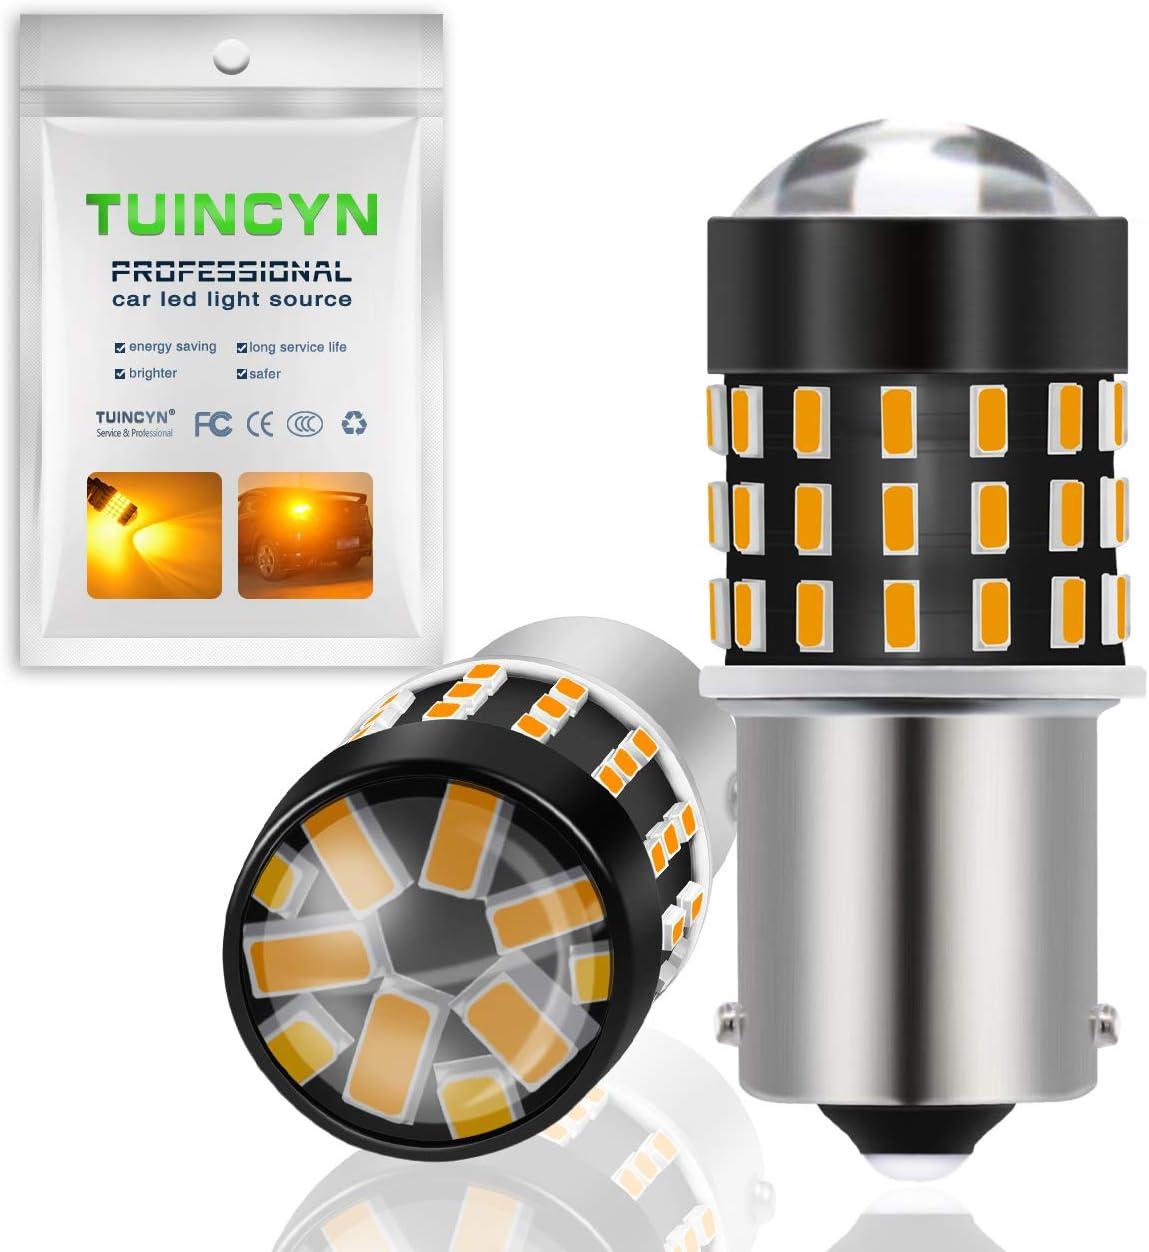 TUINCYN 3157 3156 LED Lampadina dei freni Super Bright 3056 3057 4157 4057 3157 T25 LED Lampadina 3014 54-EX Chipset Lampadina per segnali di svolta Luce Backup luce retromarcia DC 12V-24V Xenon White